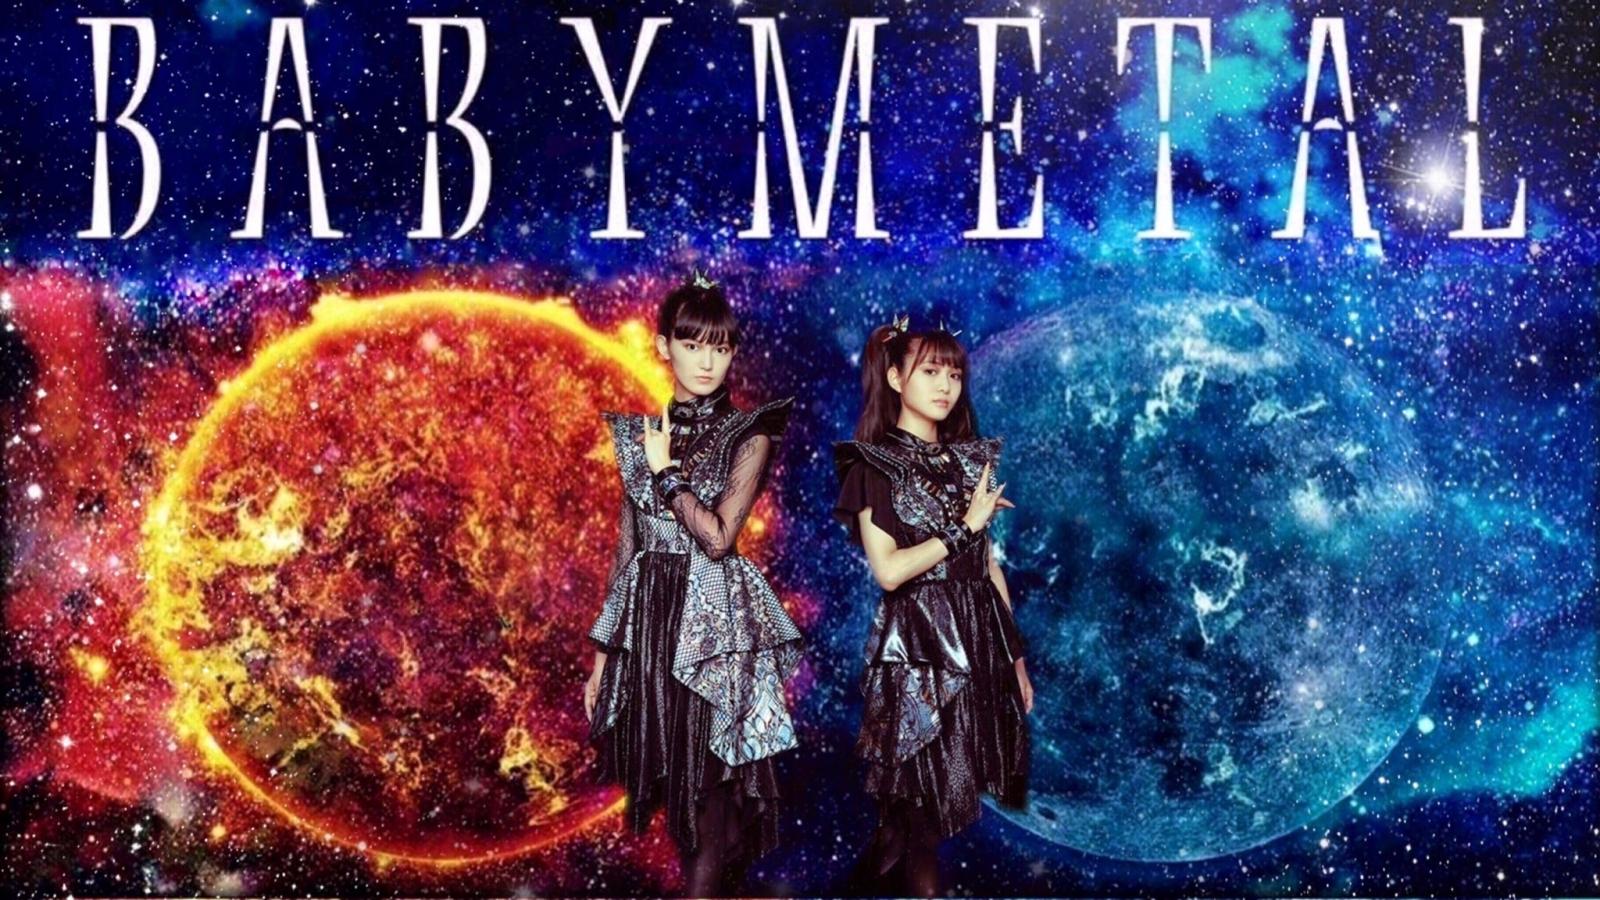 babymetal-metal-galaxy.jpg